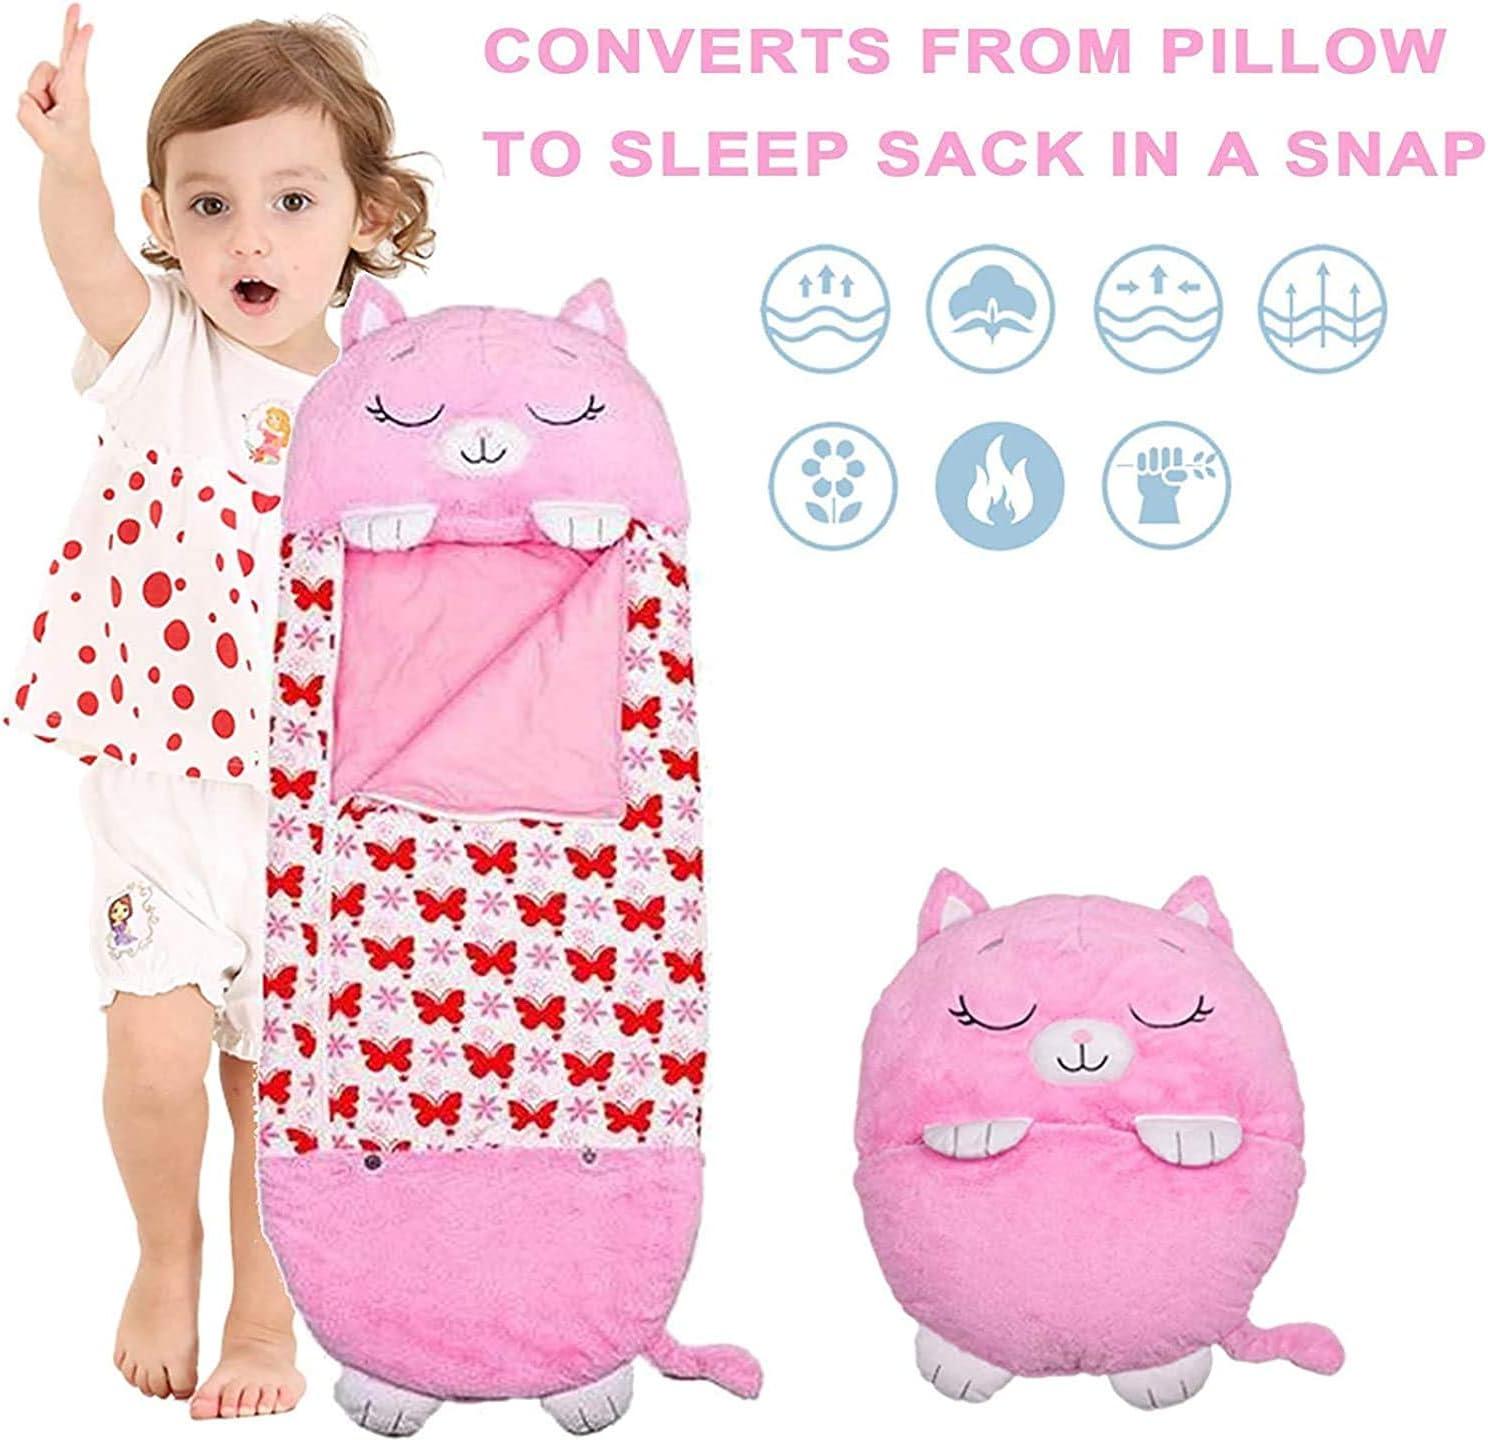 Medium 3-6yrs White Unicorn Comfy Fun One-piece Childrens Pajamas Sleeping Bags Kids Play Pillow and Sleeping Bag 2 IN 1 Cartoon Animal Sleeping Bag for Boys Girls Gift Fun Sleeping Bag For Kids